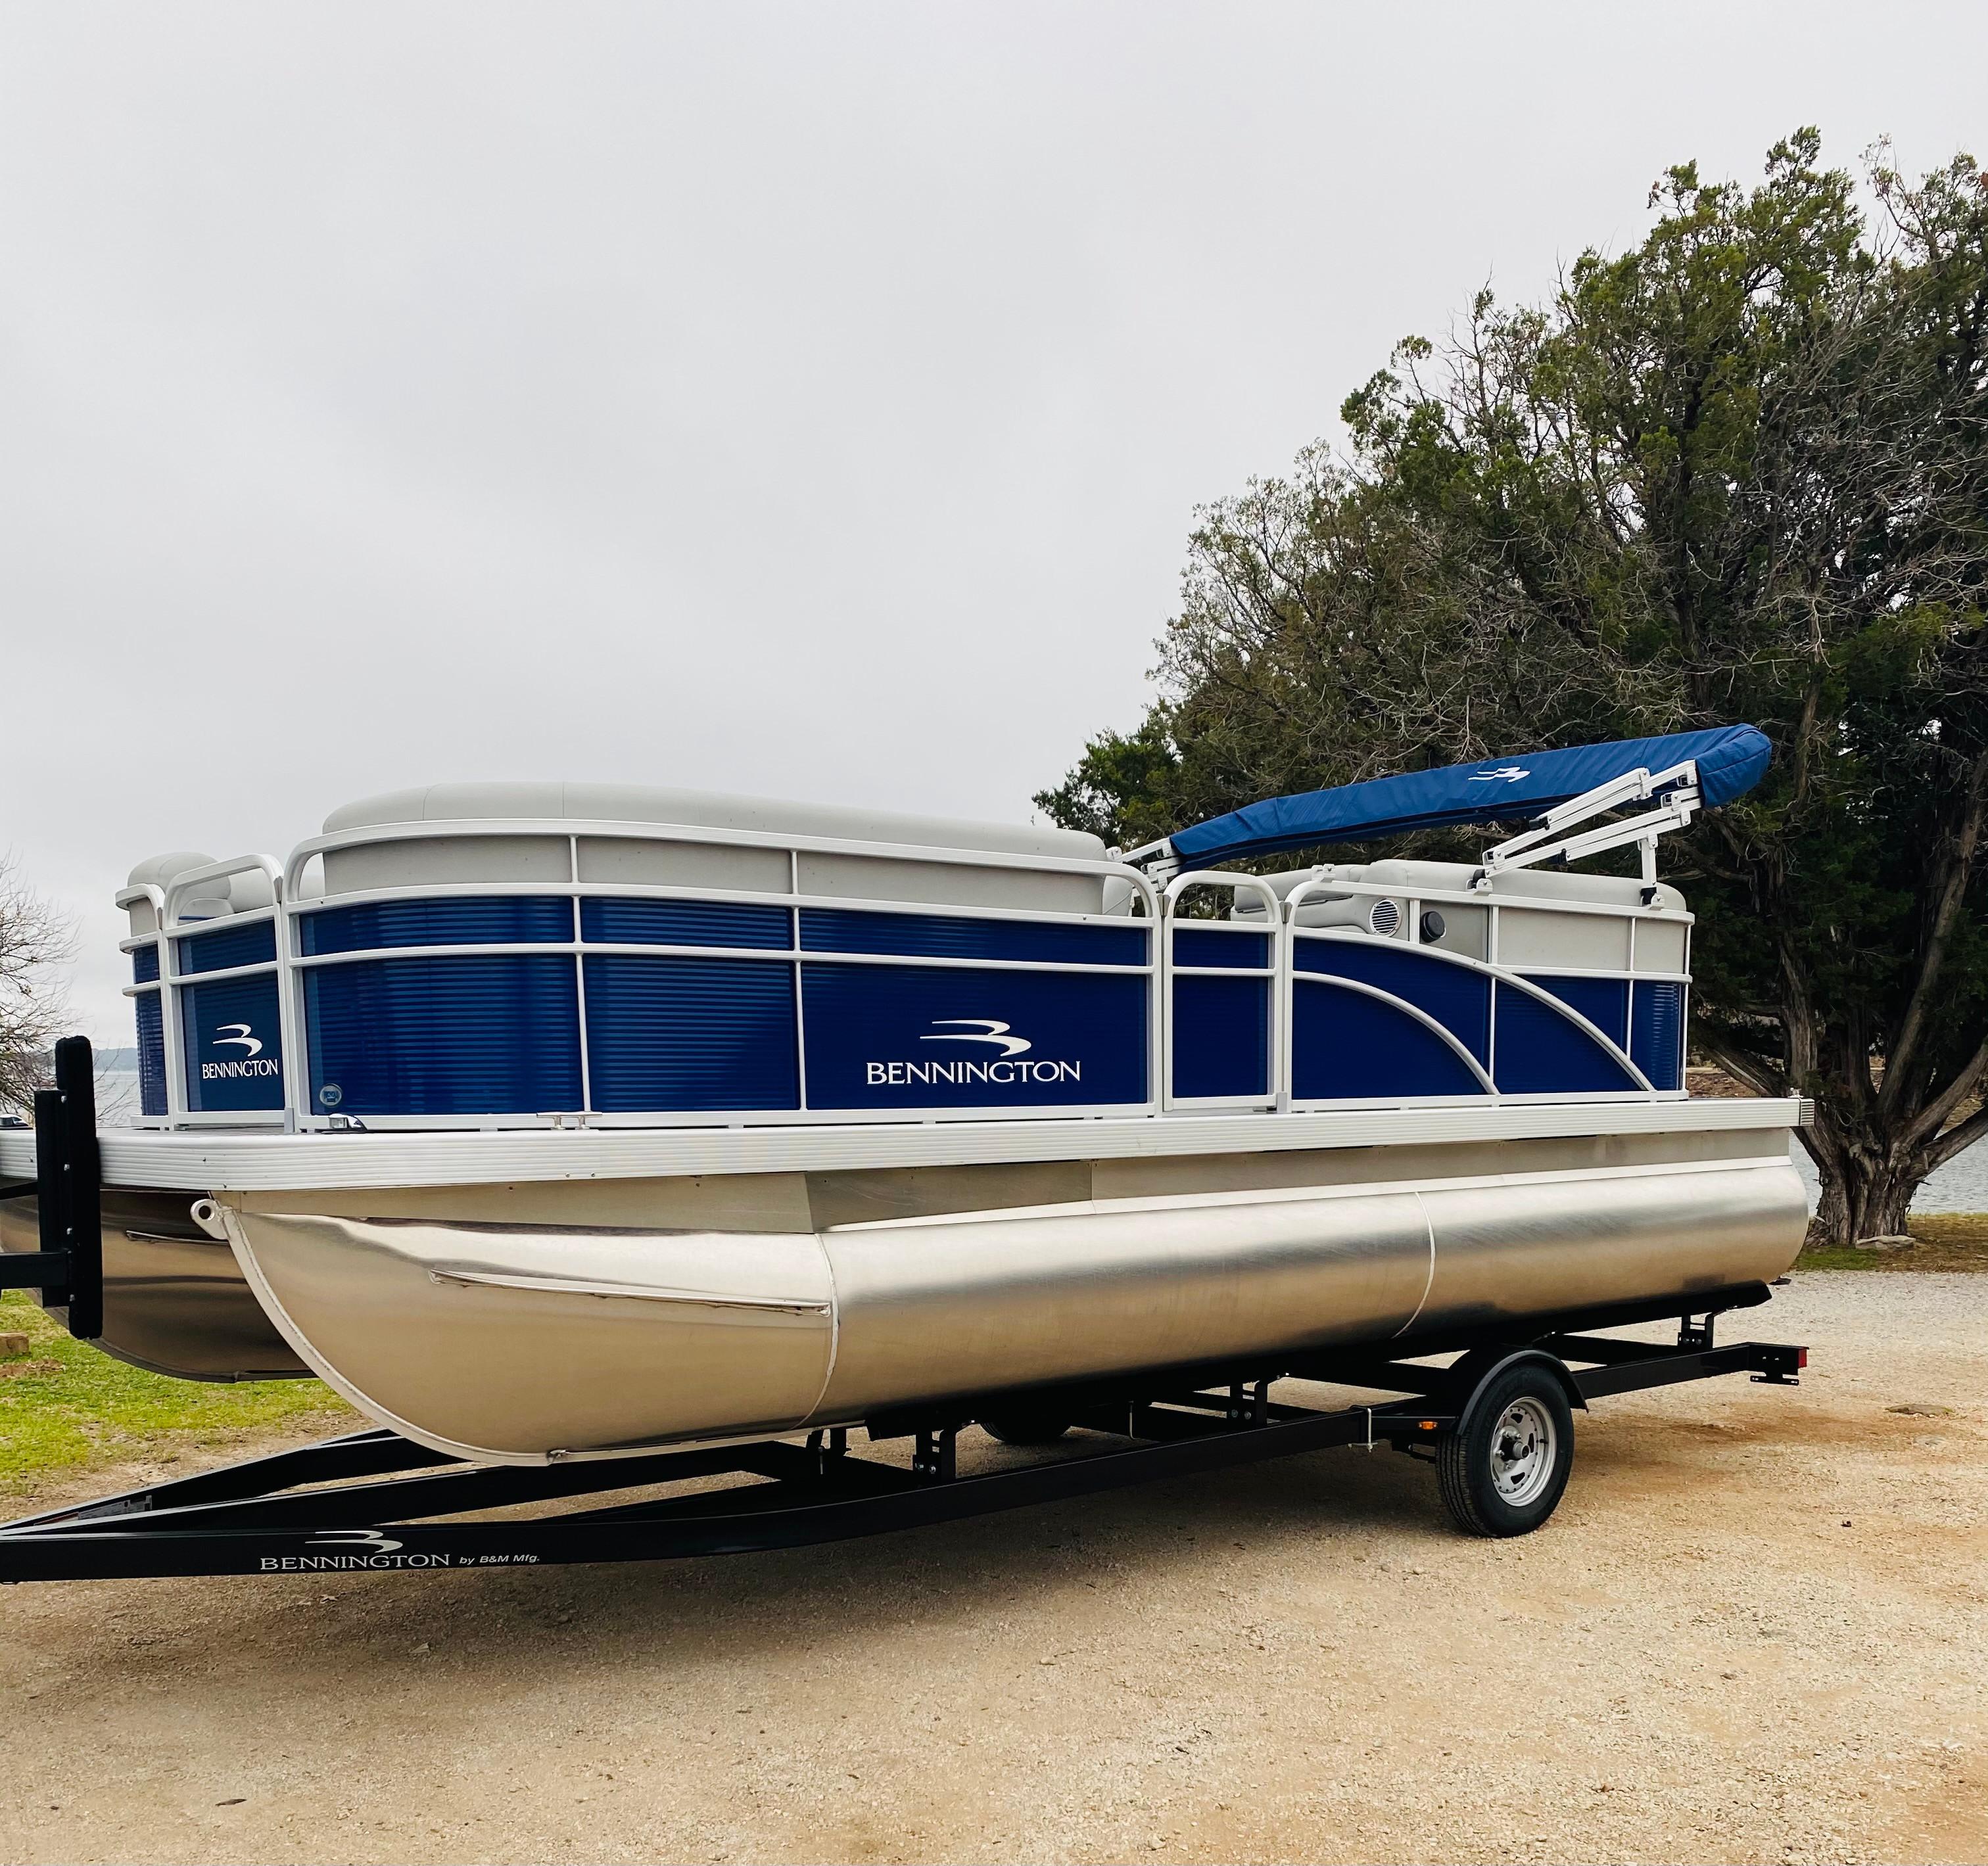 18 Foot Boat Rental 1/2 Day